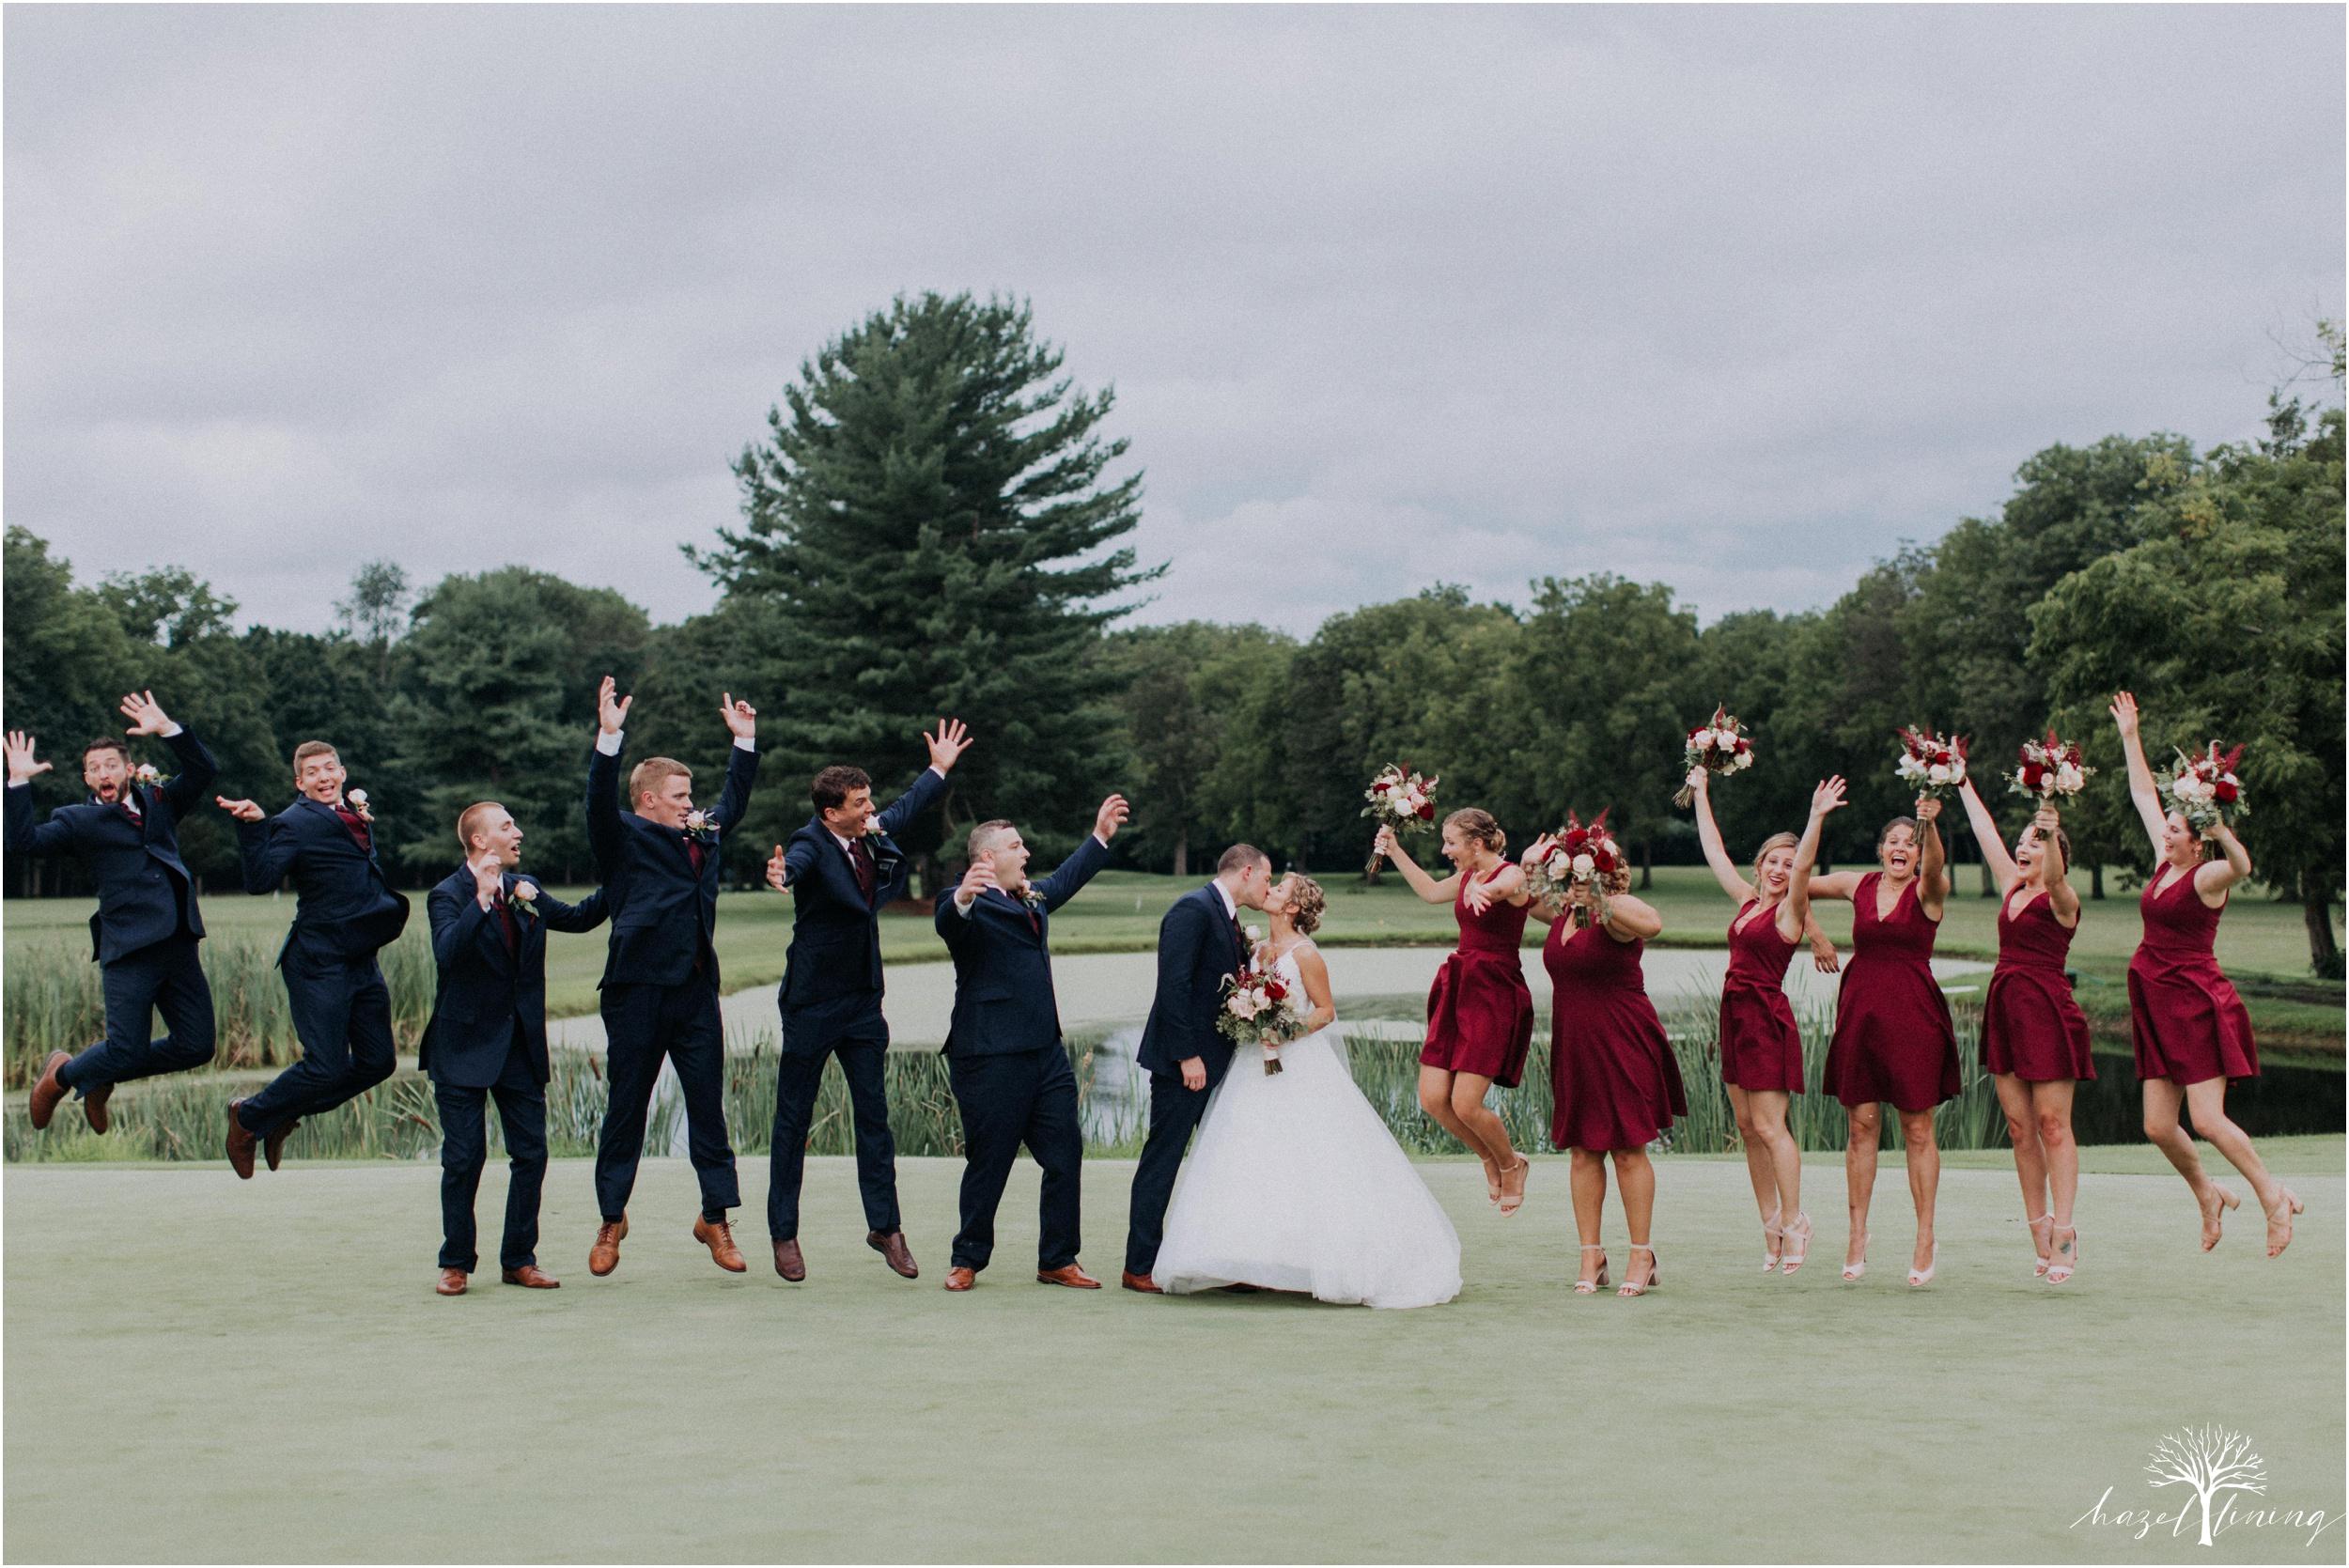 jonathan-weibel-becky-haywood-loft-at-sweetwater-cc-pennsburg-pennsylvania-rainy-day-summer-wedding-hazel-lining-travel-wedding-elopement-photography_0077.jpg